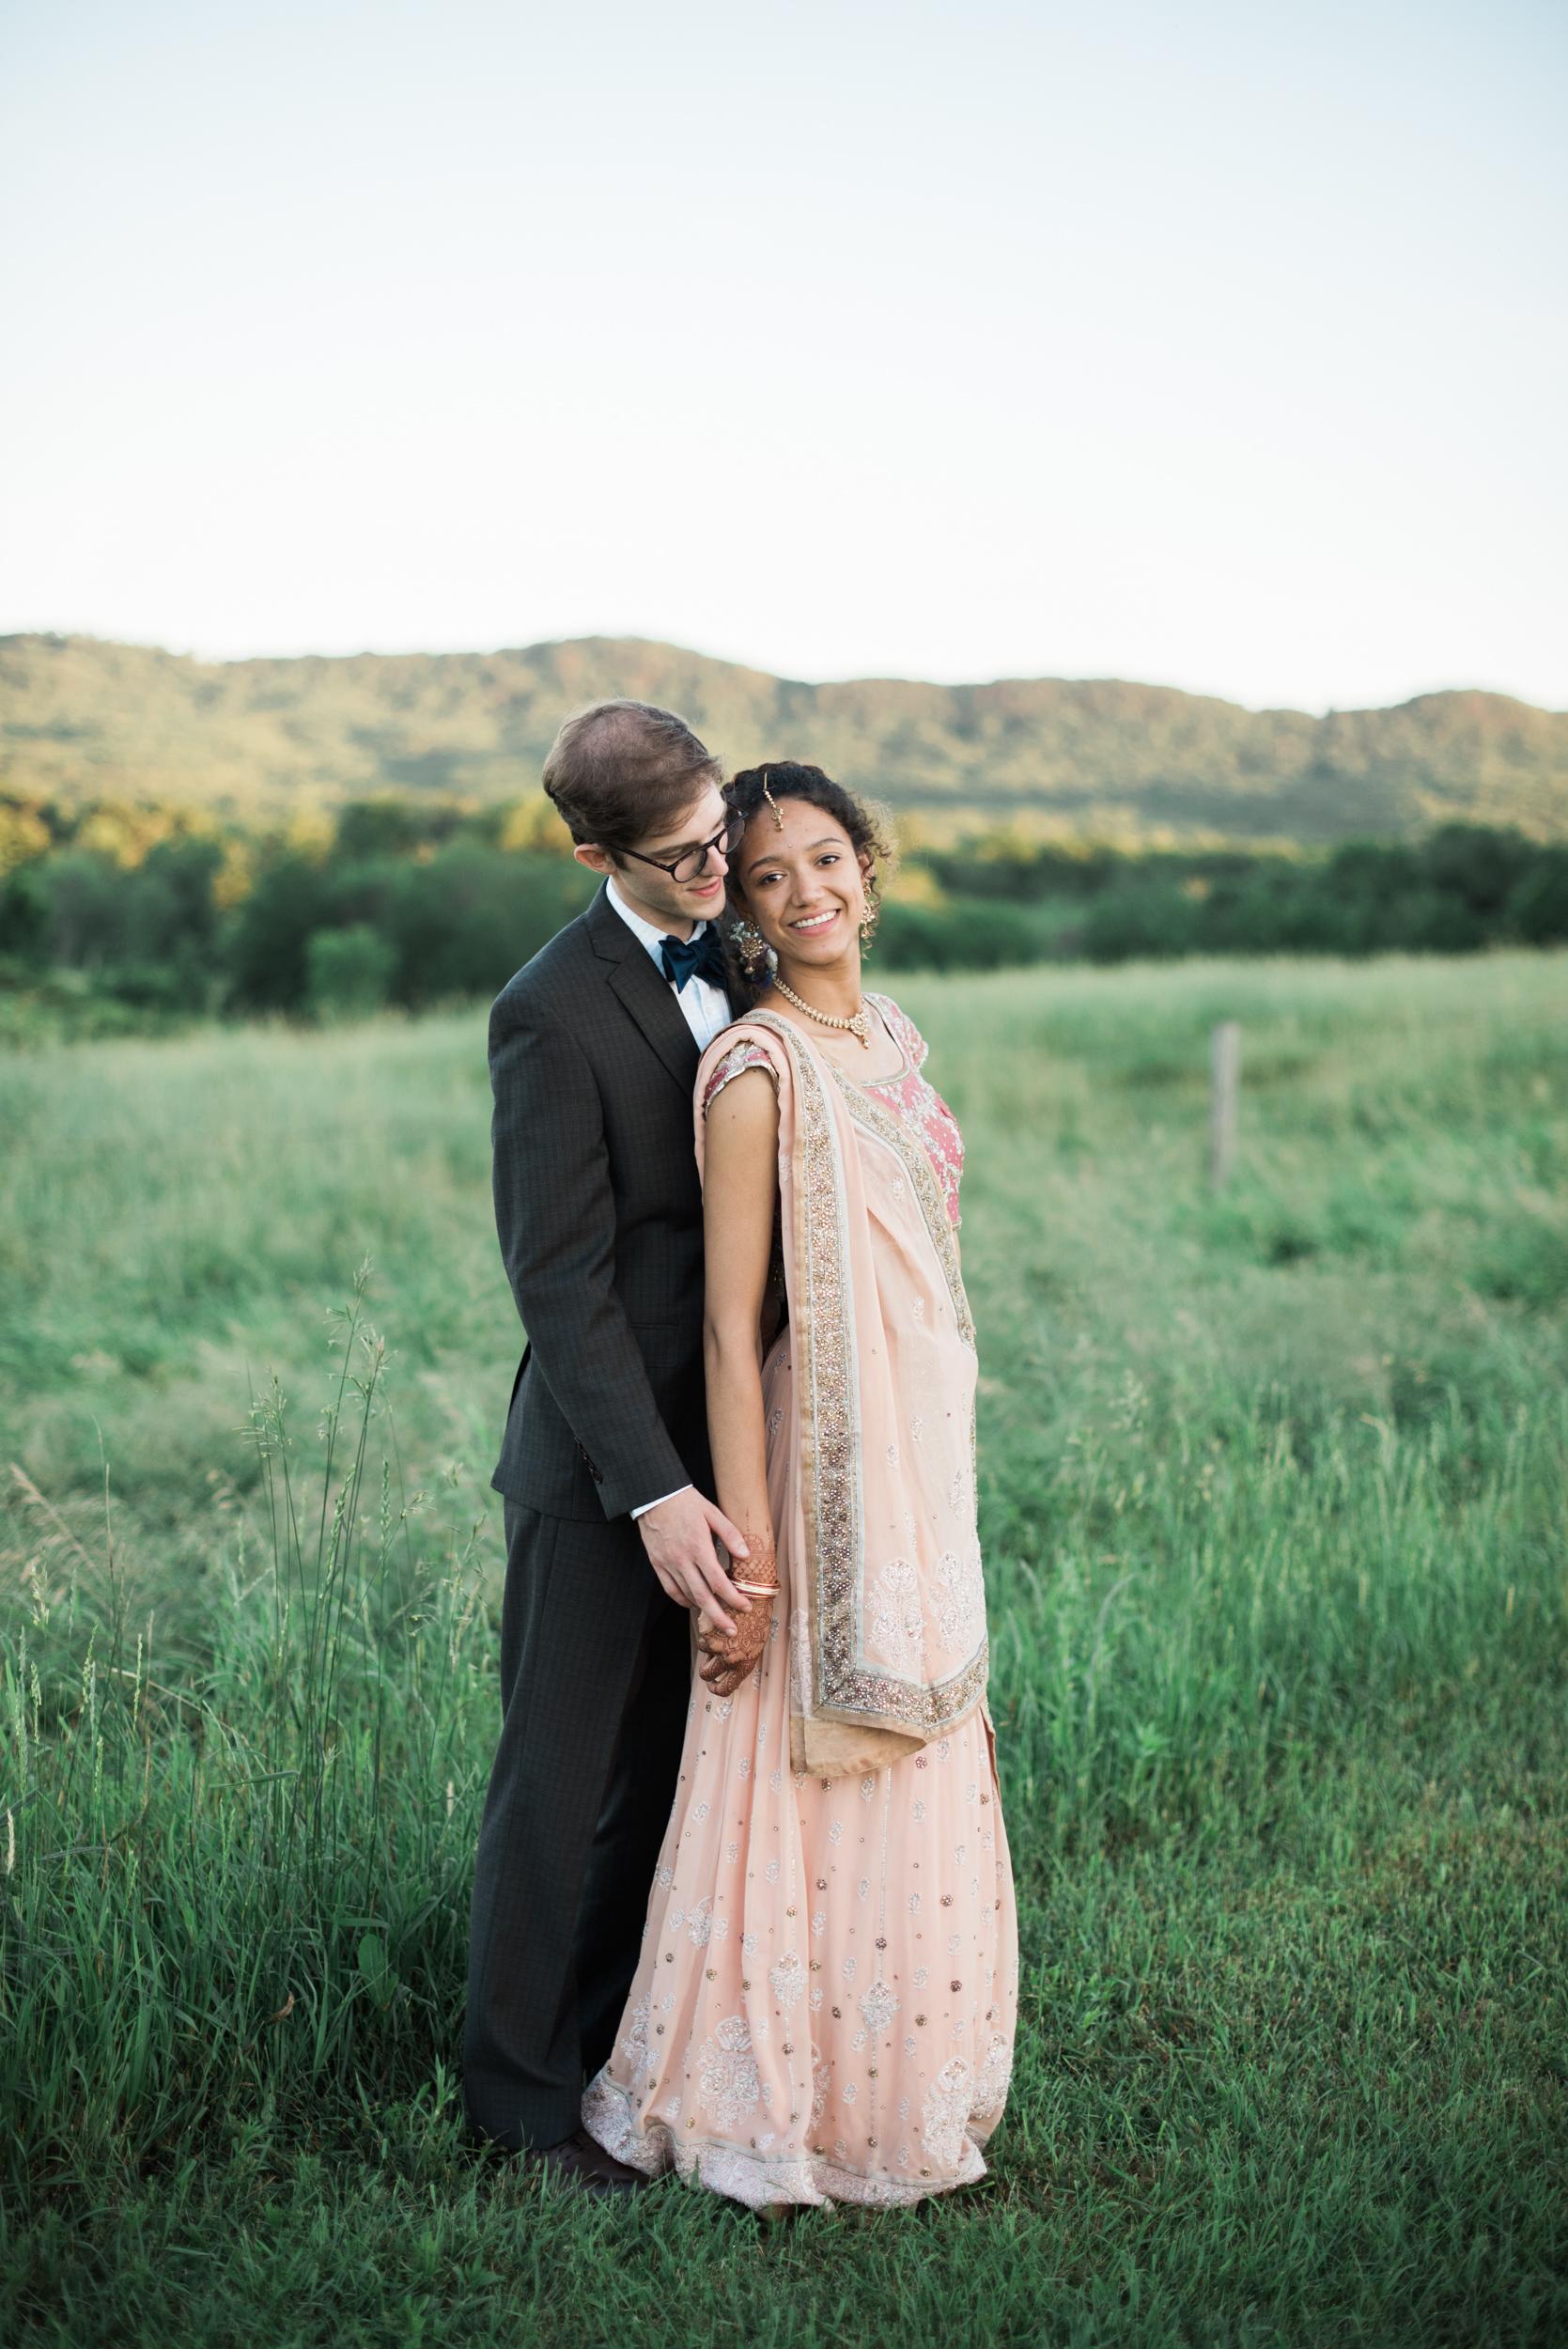 Wedding Photographer in Newport MA